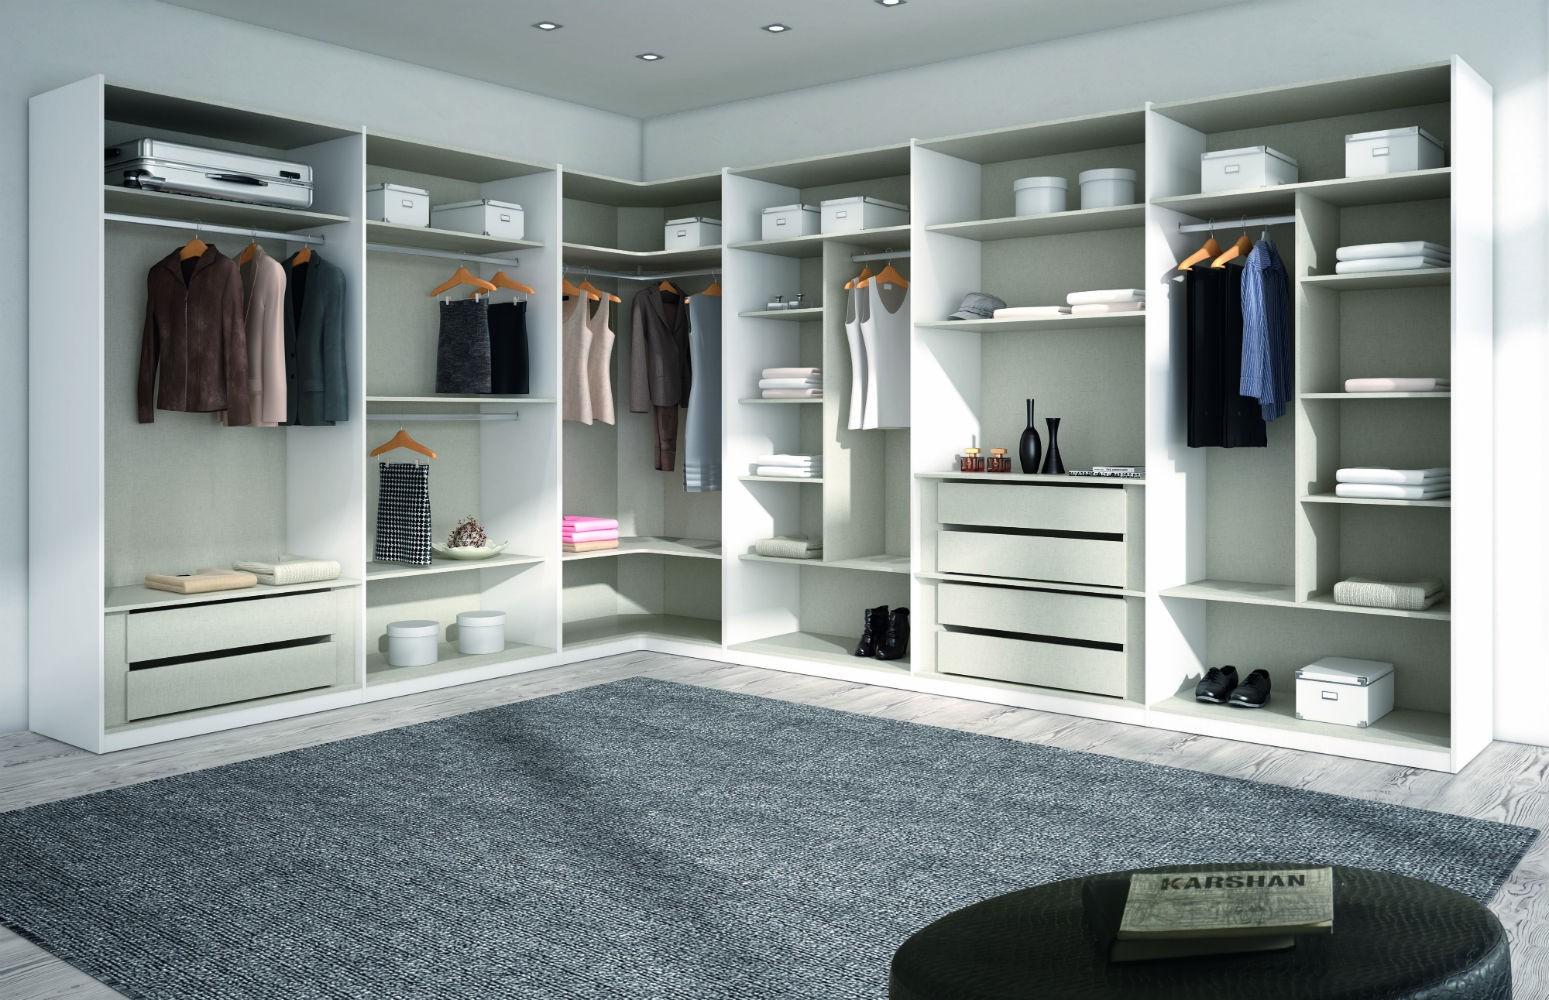 Dormitorio matrimonio moderno muebles valencia for Modelos de dormitorios modernos